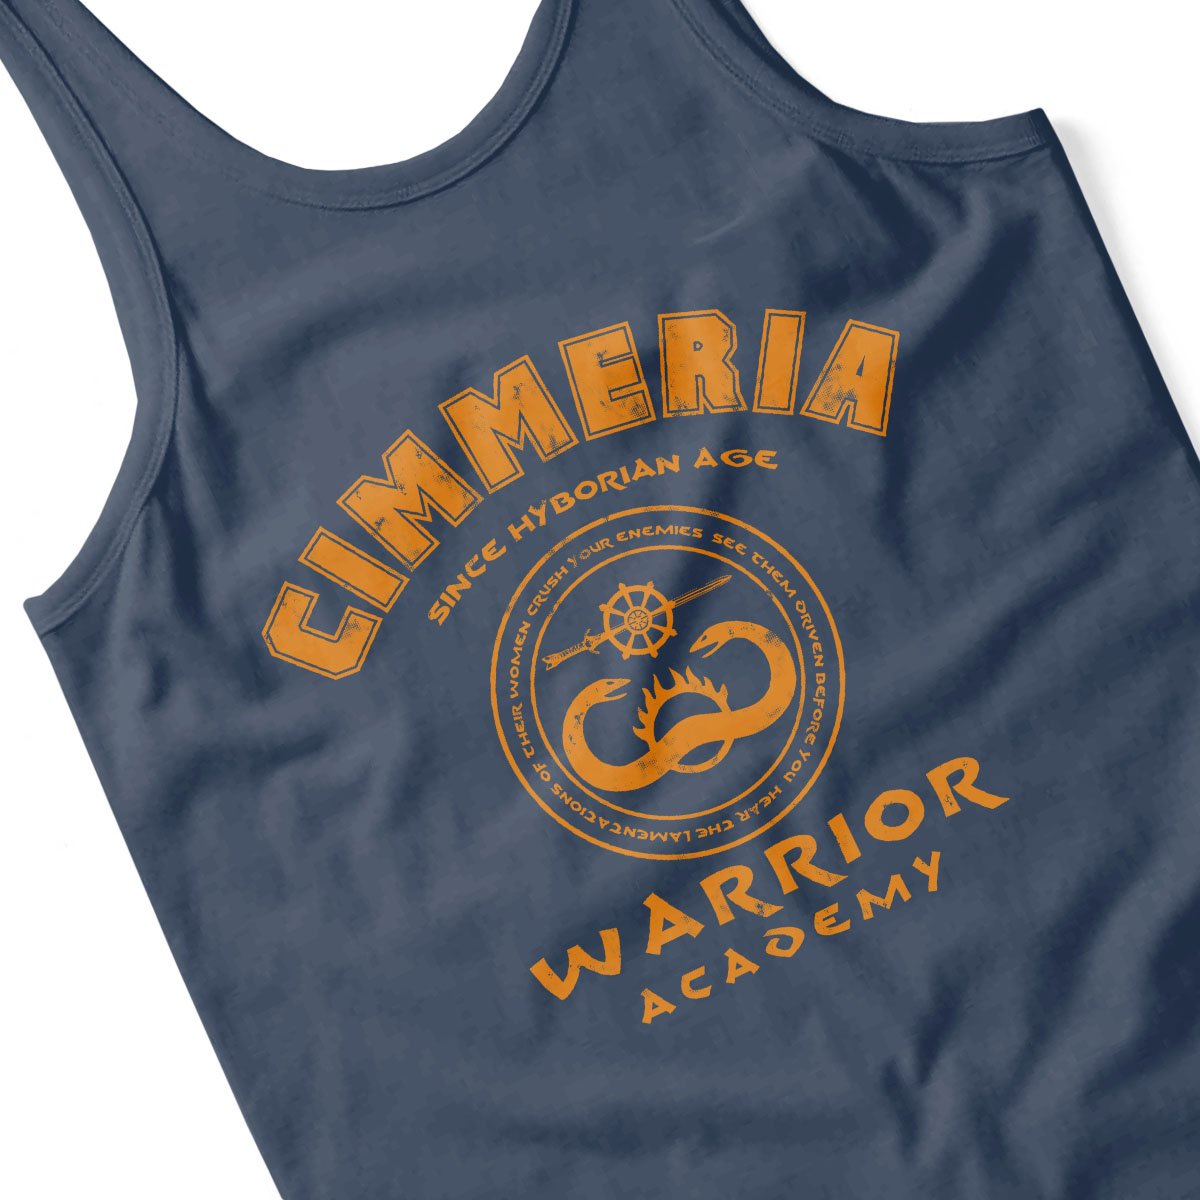 Cimmeria Warrior Academy Conan The Barbarian Mens Vest